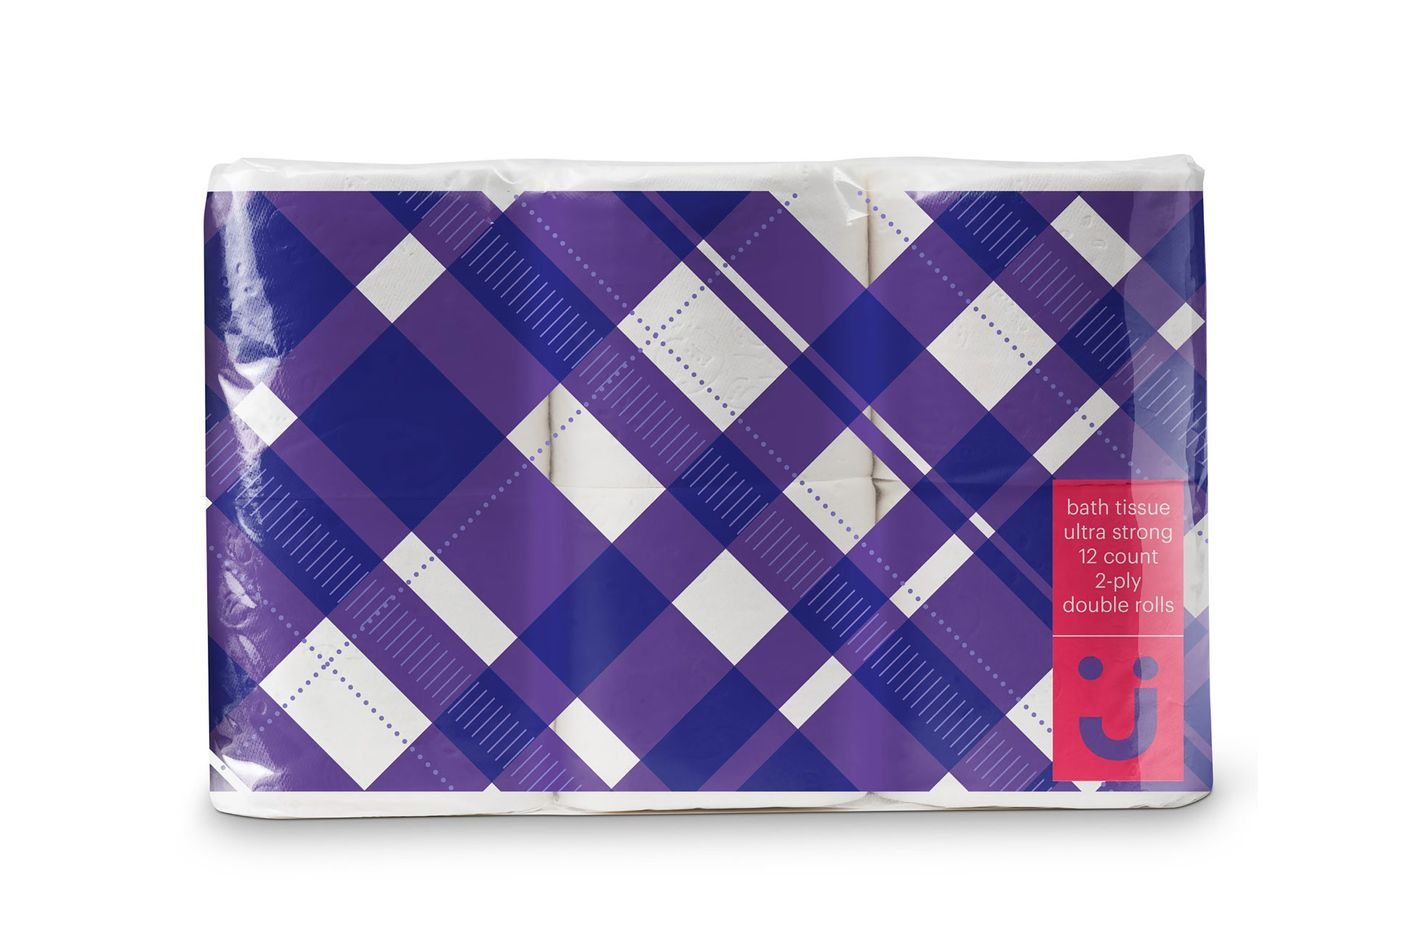 Uniquely J Ultra Strong Toilet Paper, 12 Double Rolls